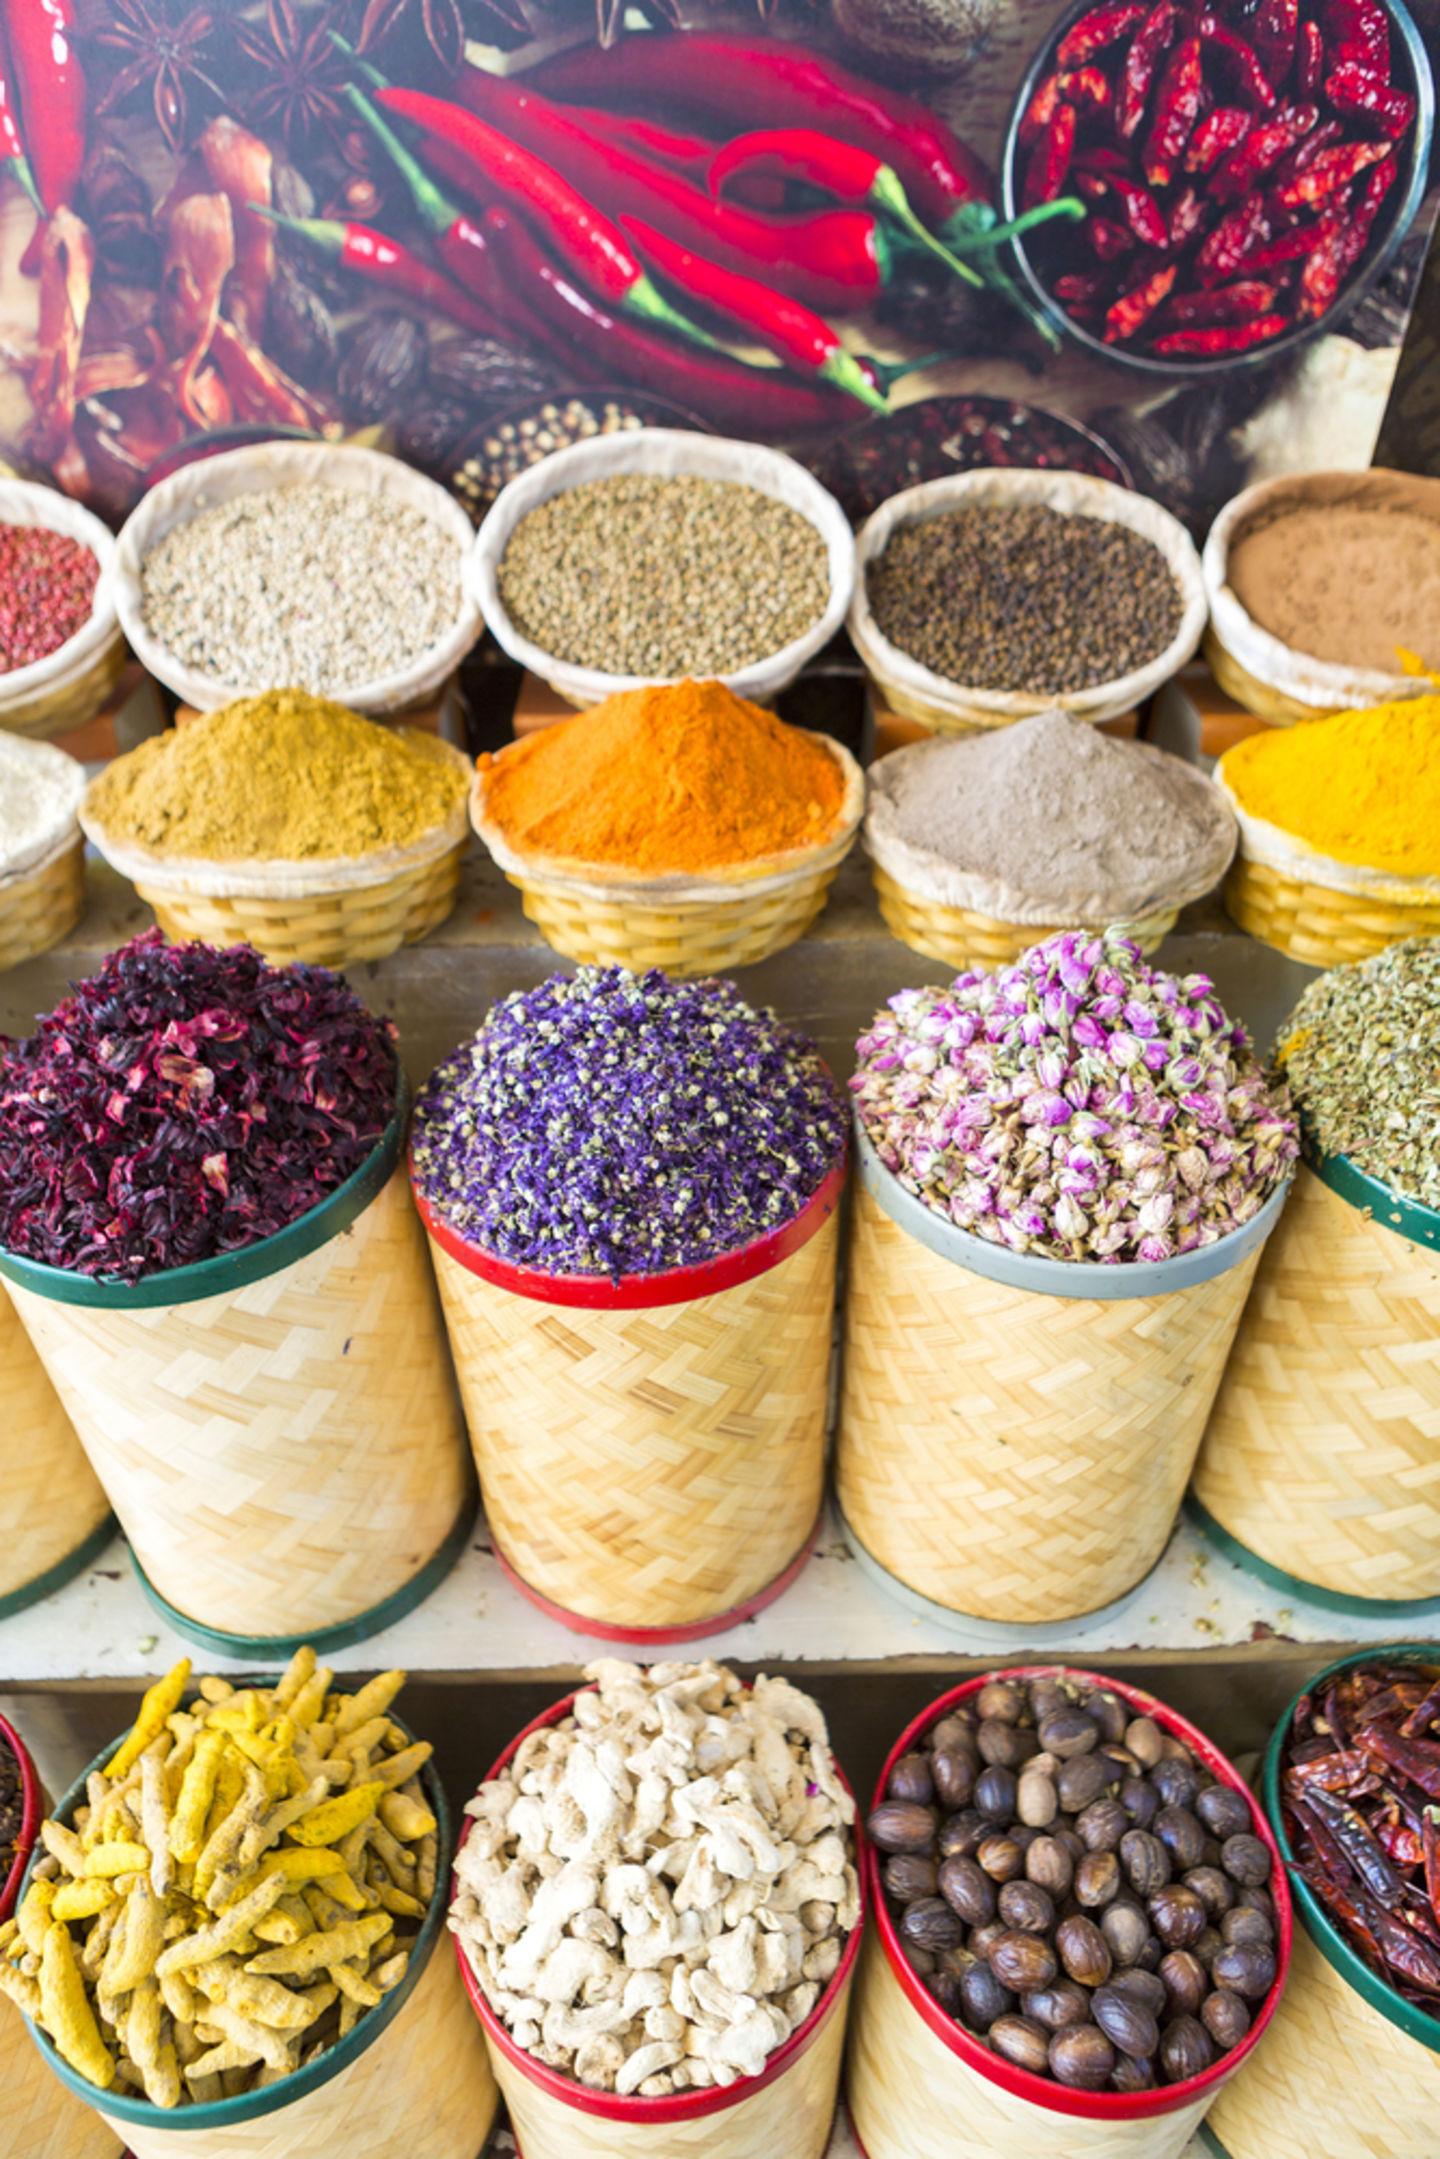 HiDubai-business-delma-commodities-general-trading-b2b-services-food-stuff-trading-al-melaheyah-dubai-2